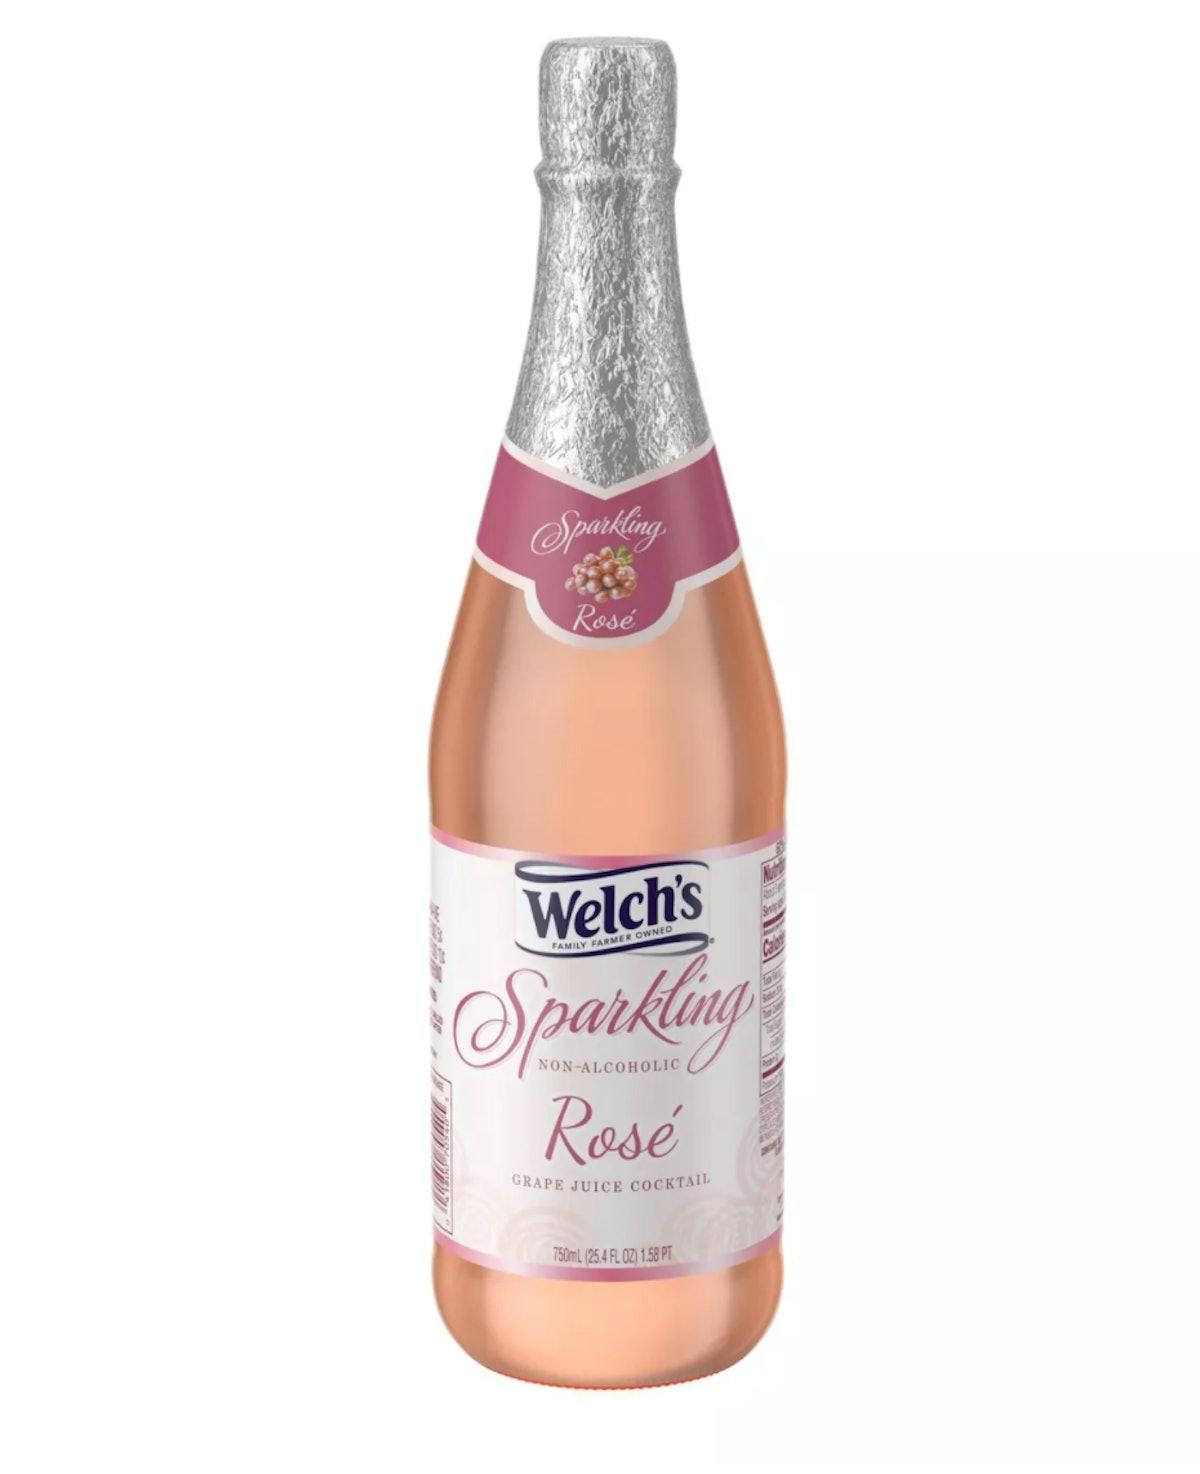 Welch's Sparkling Rosé